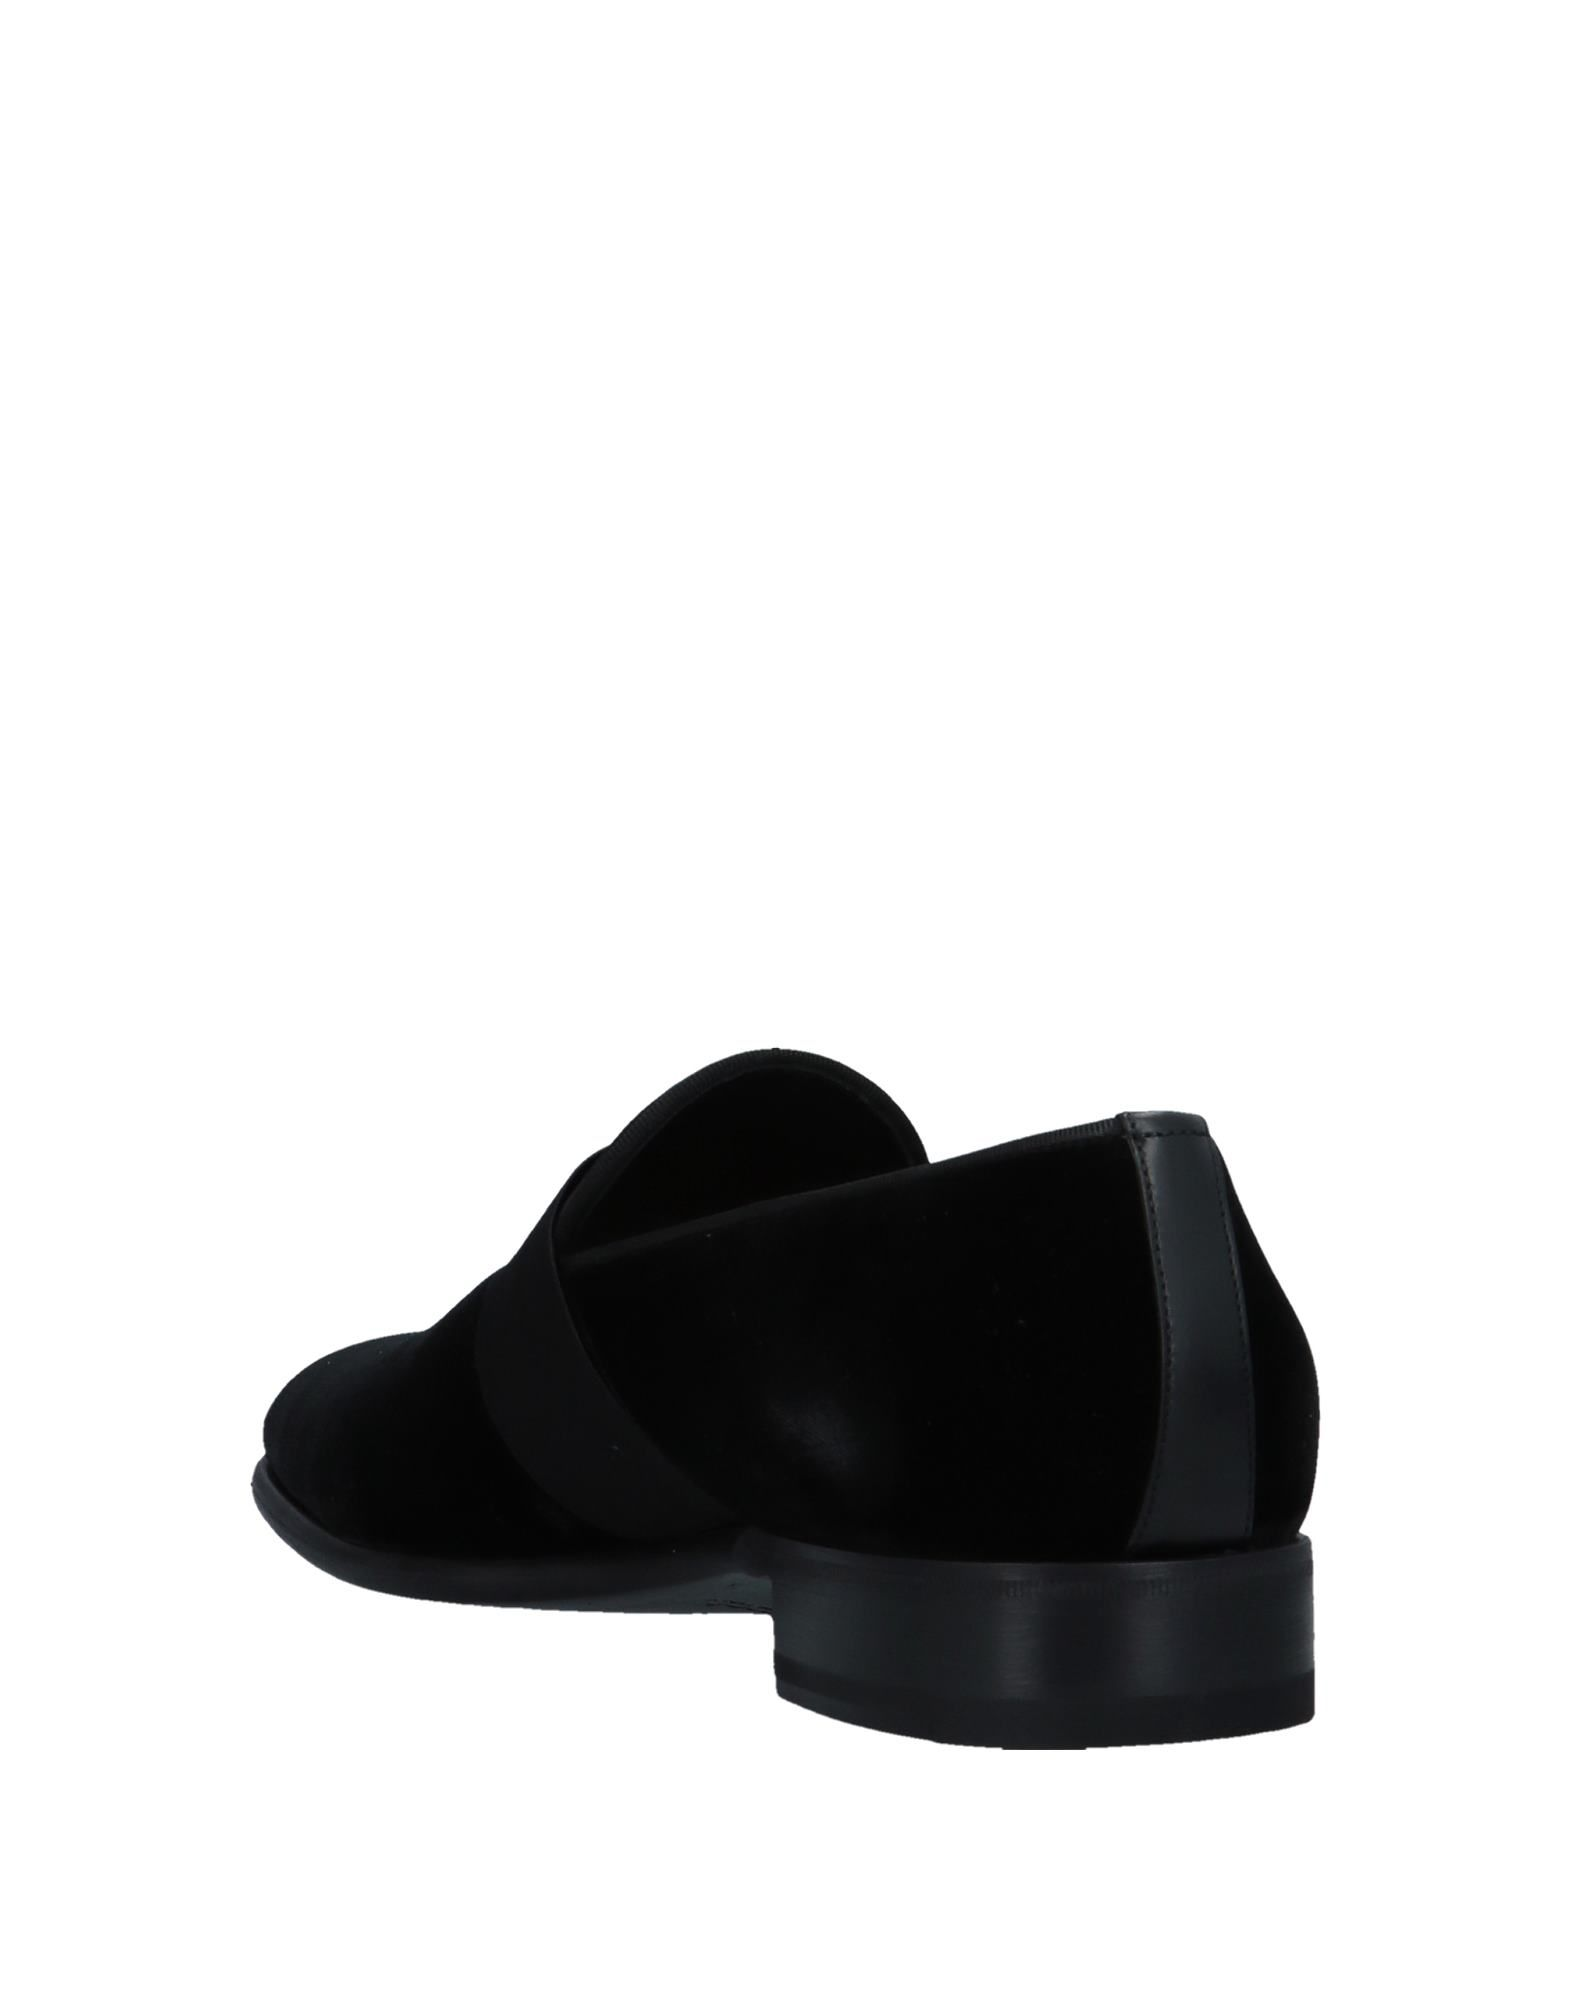 Santoni Mokassins Herren  11541500OU Gute Qualität beliebte Schuhe